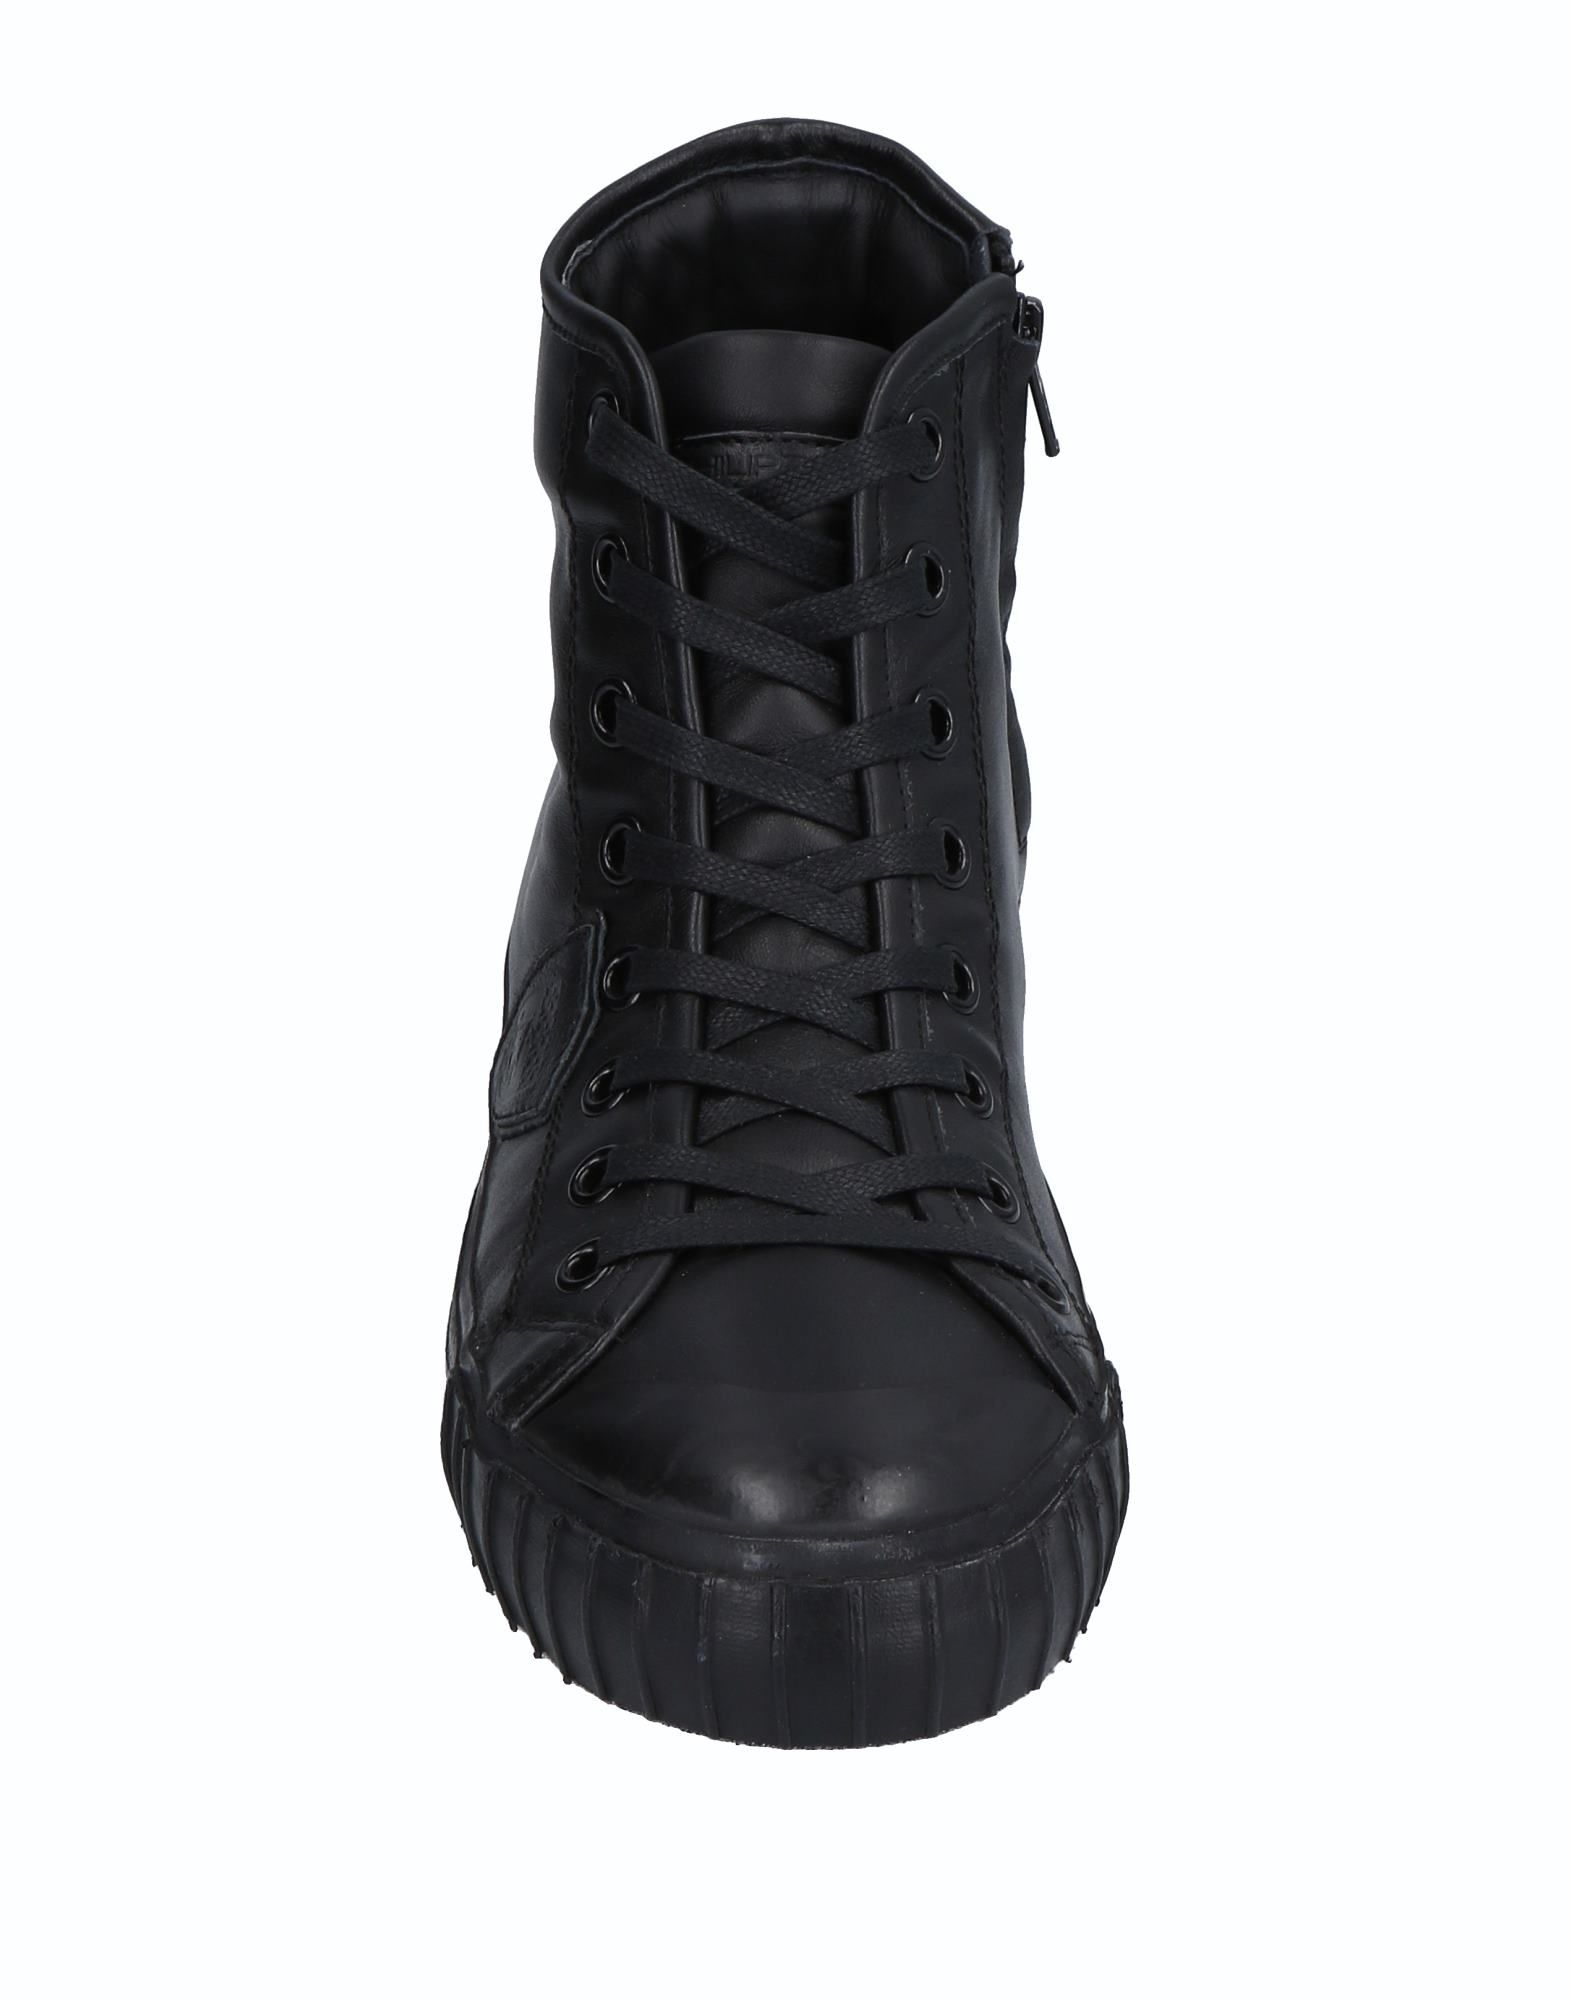 Philippe Model Model Philippe Sneakers Herren  11514837FW 49bb65